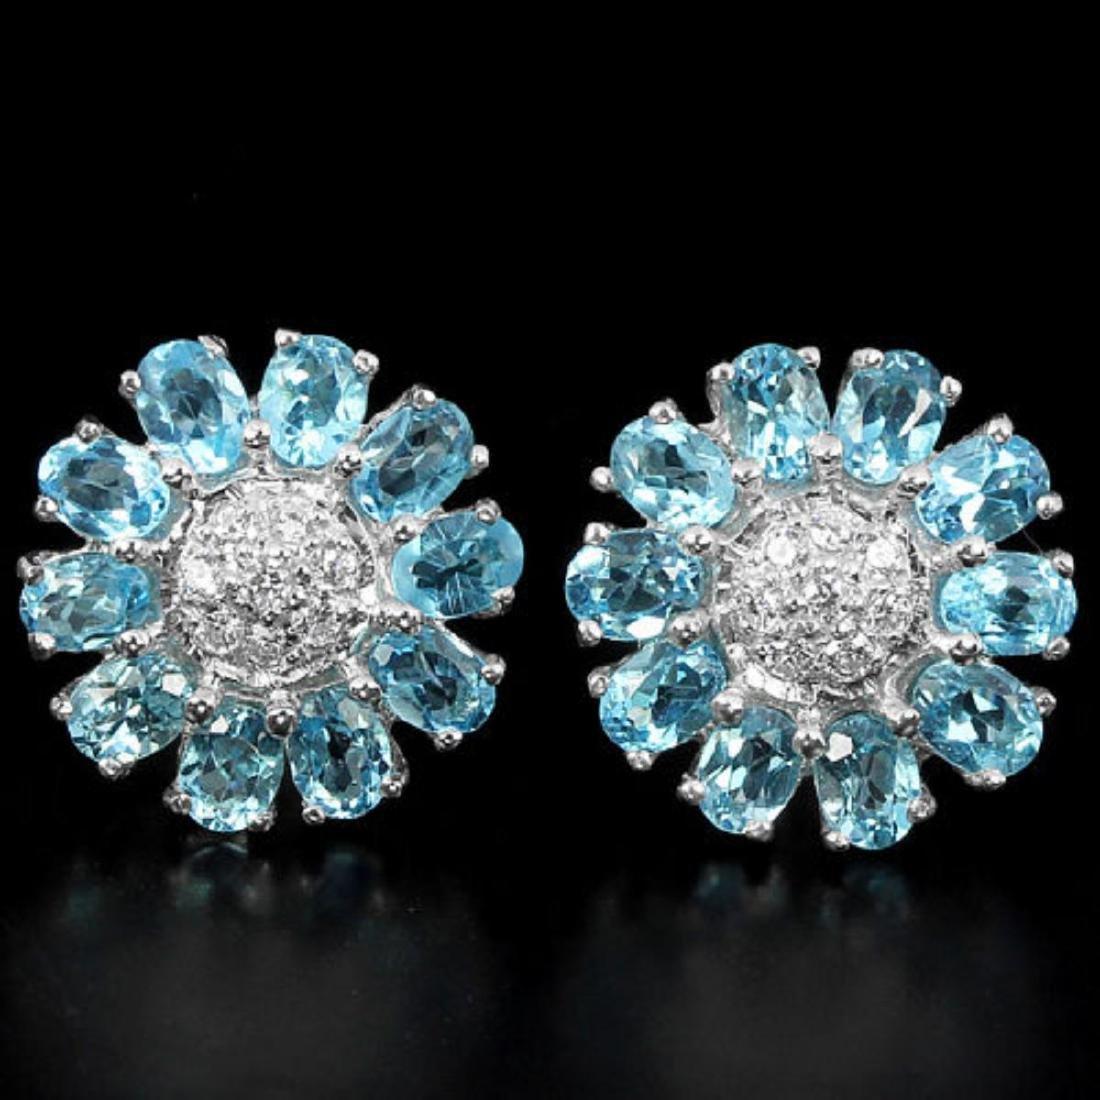 Natural Swiss Topaz Earrings